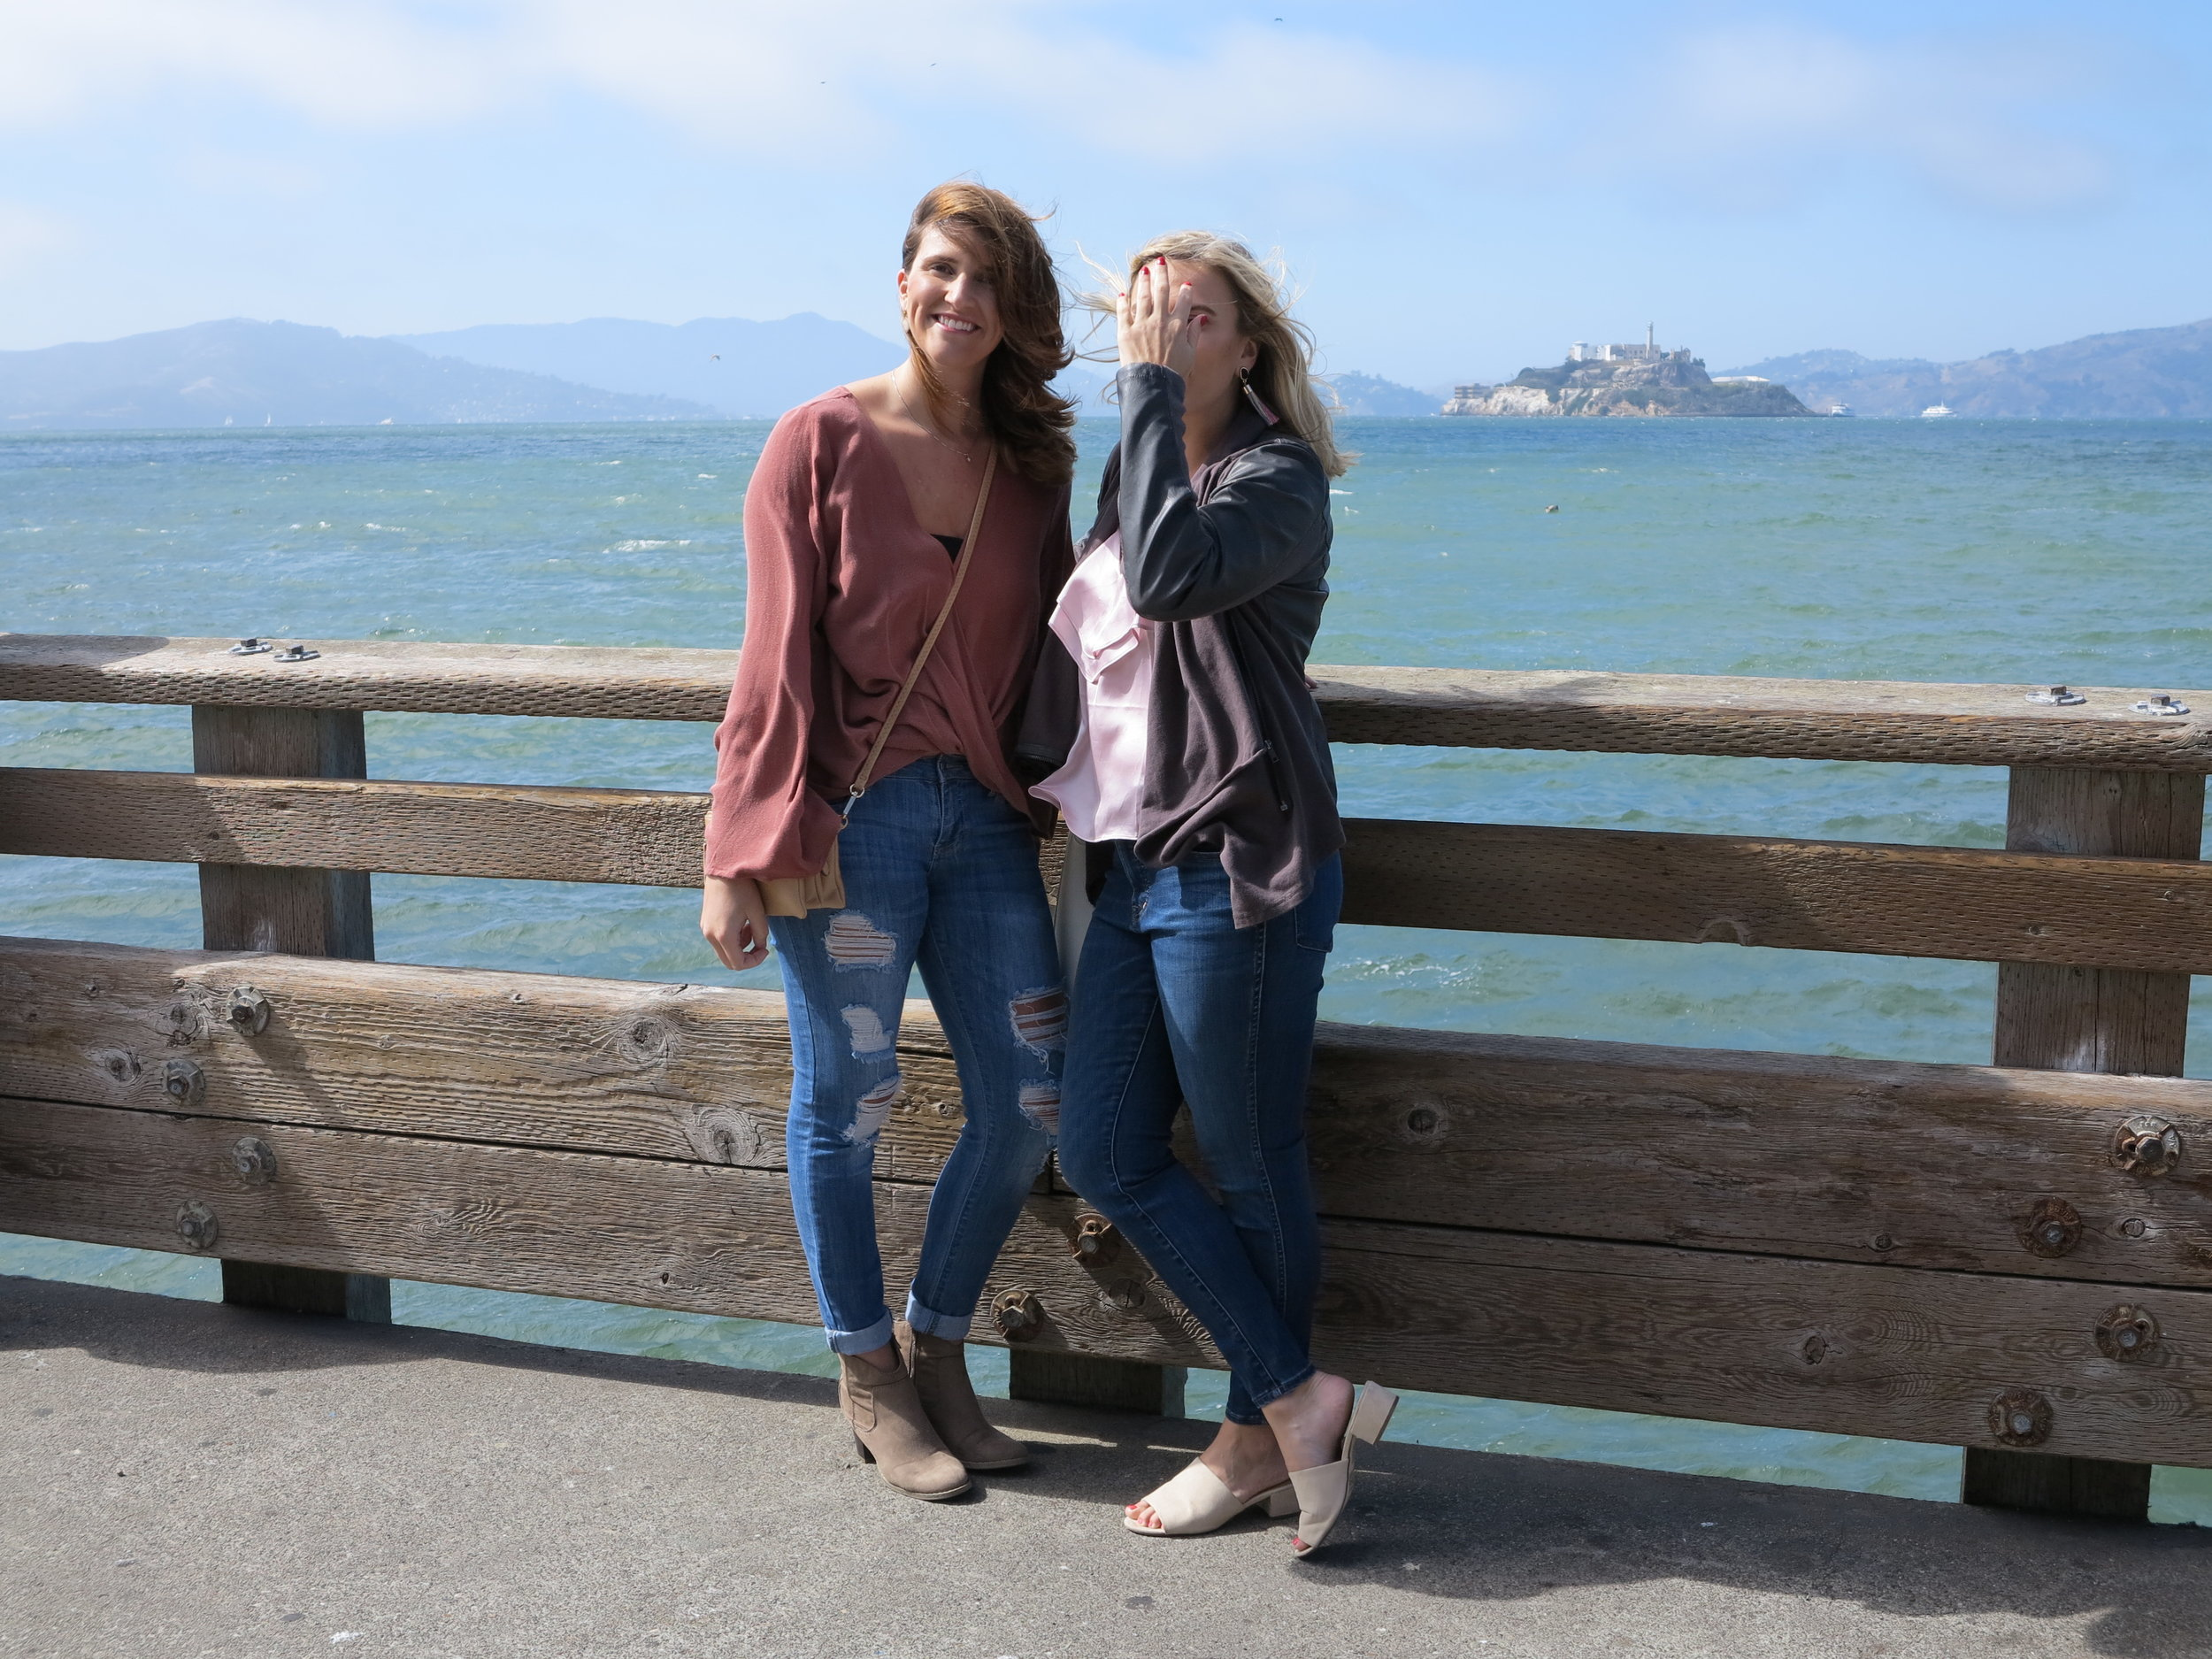 Kelly and I in front of Alcatraz.